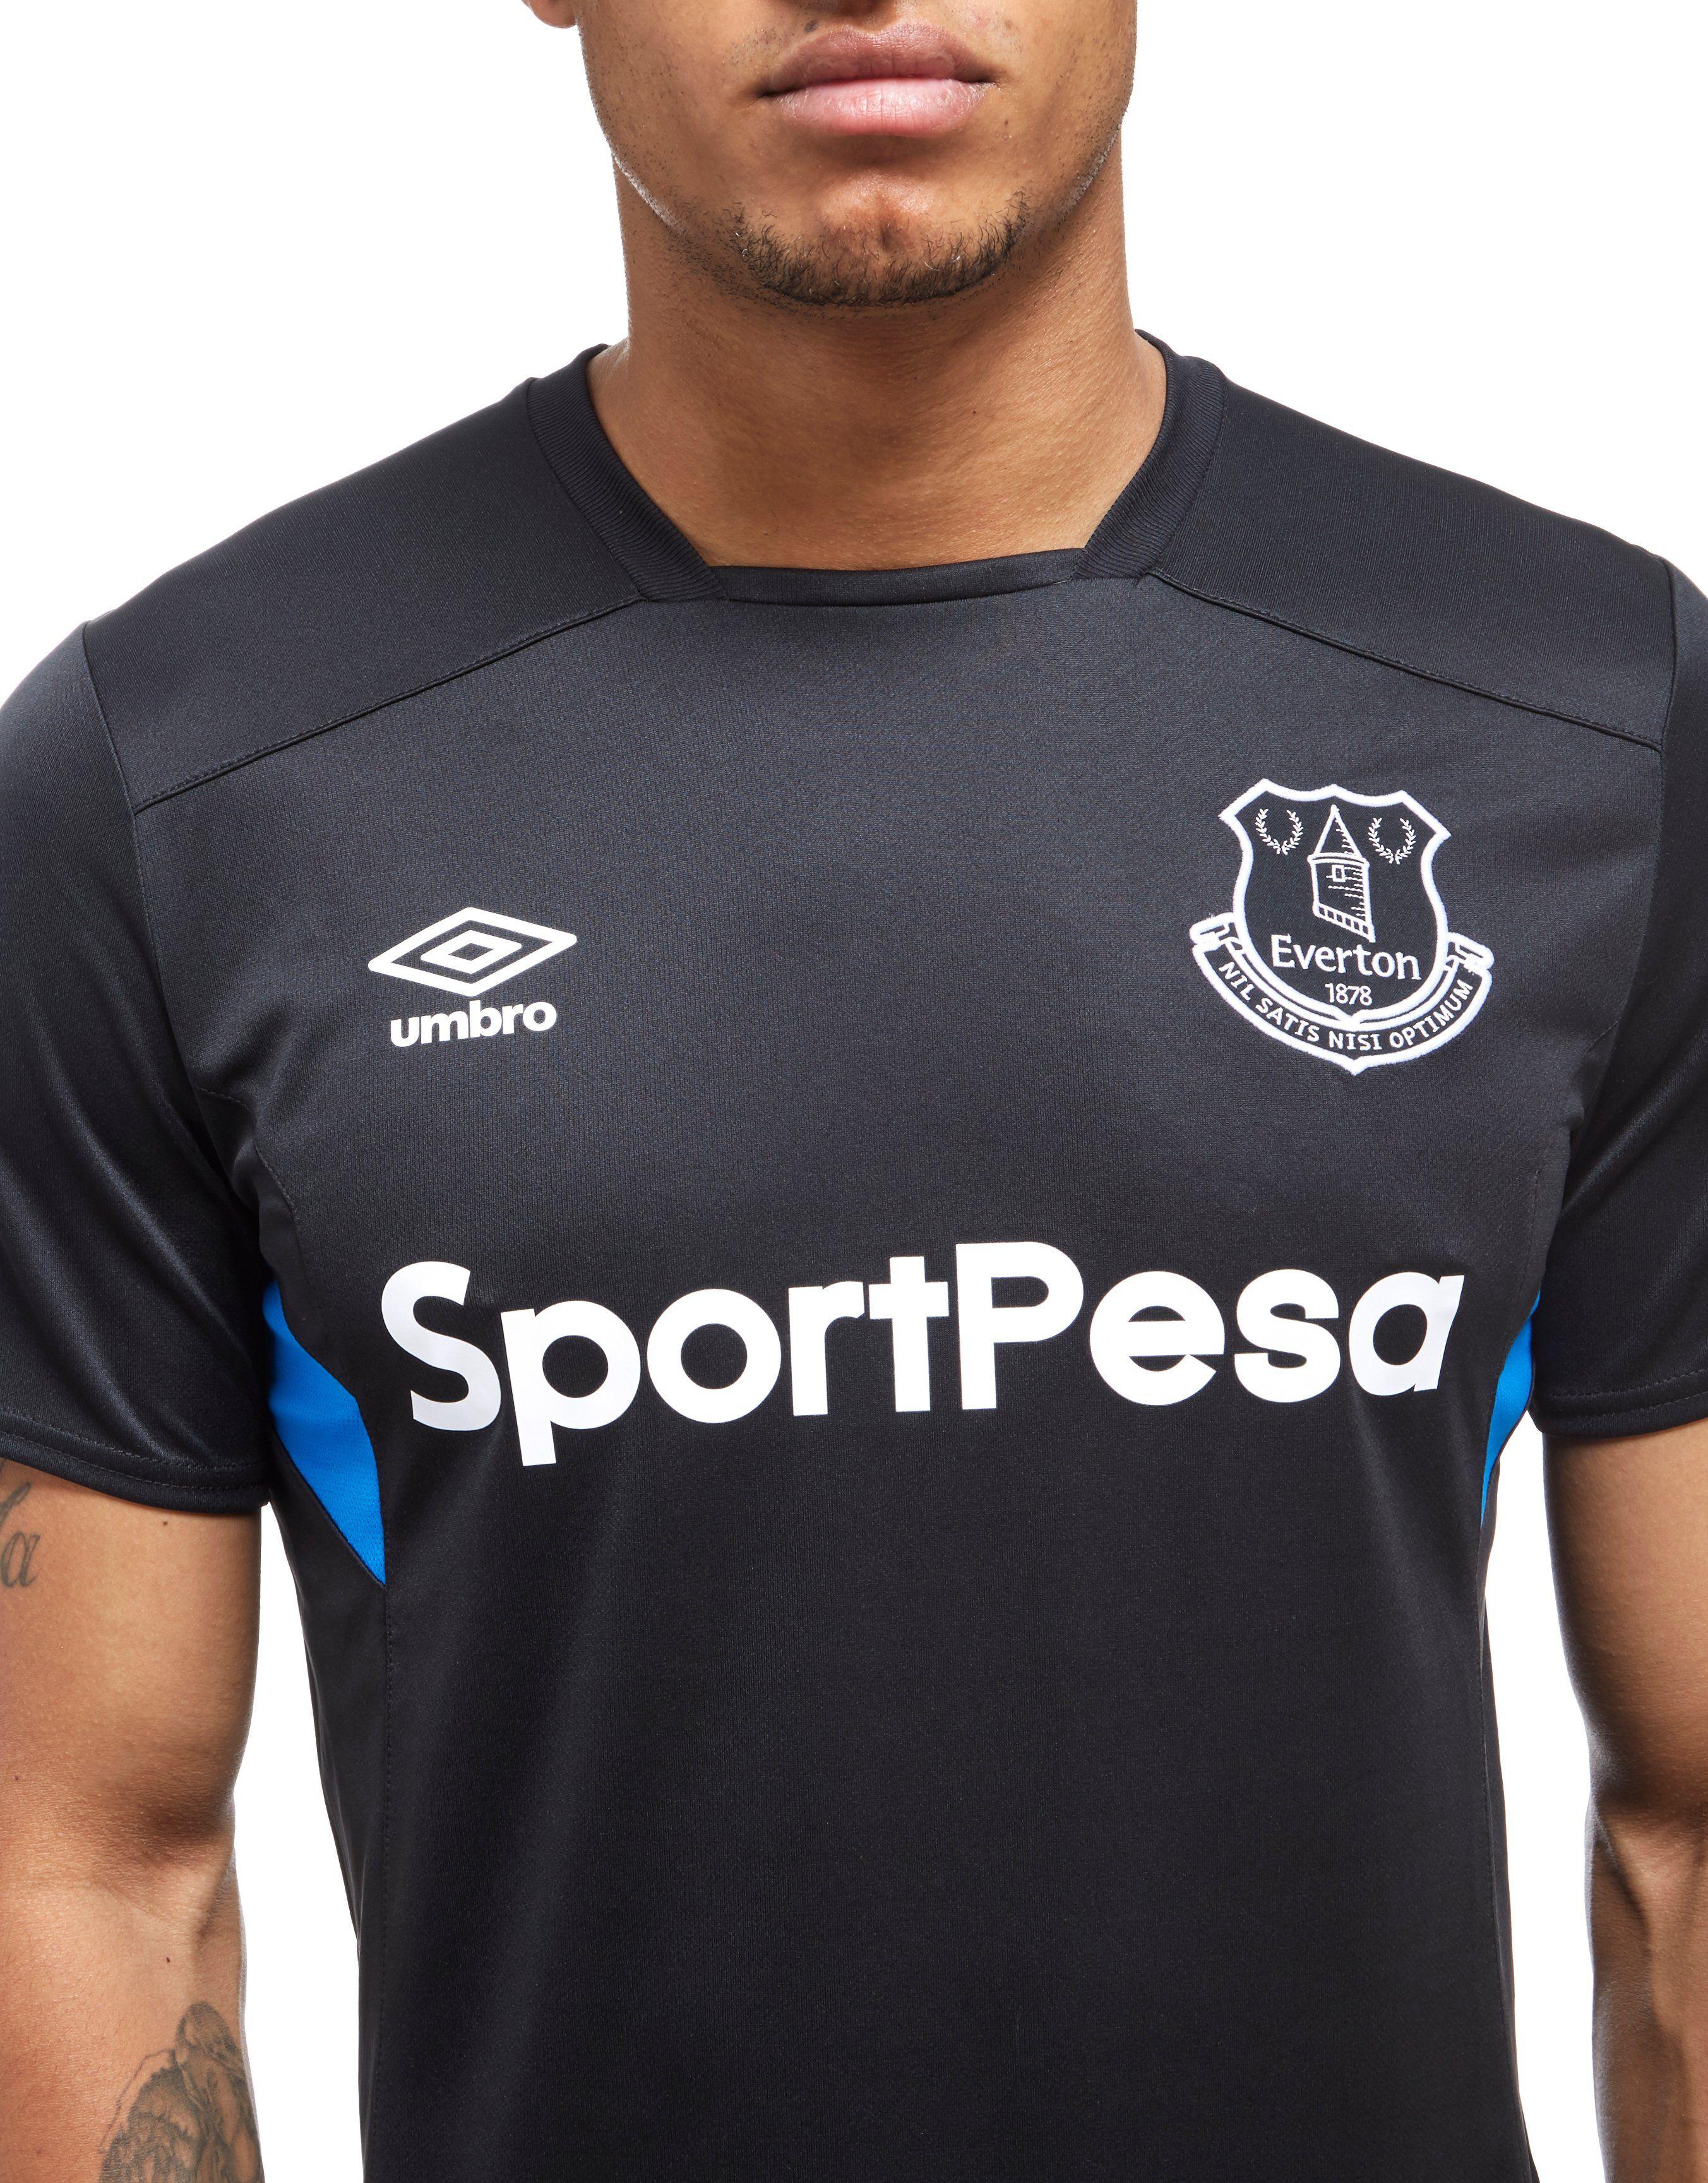 Umbro Everton FC Training Shirt